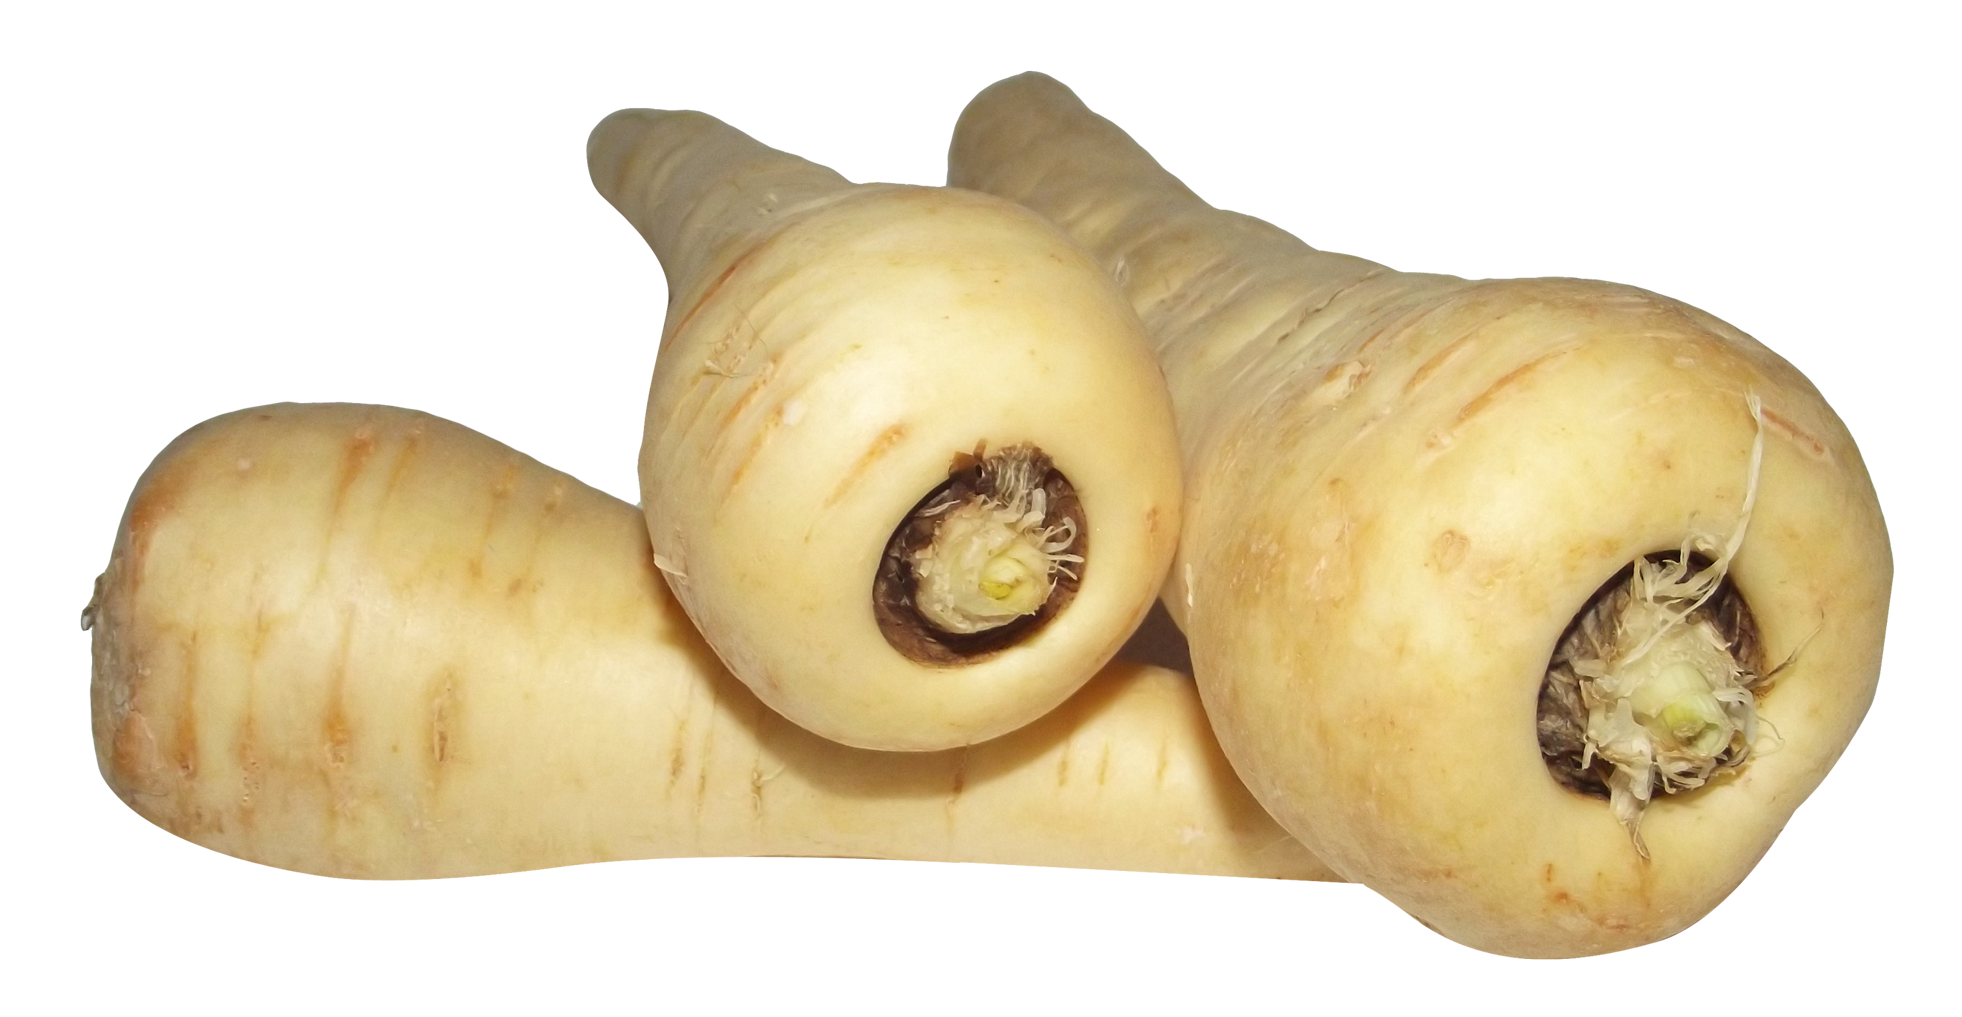 Parsnip PNG Image